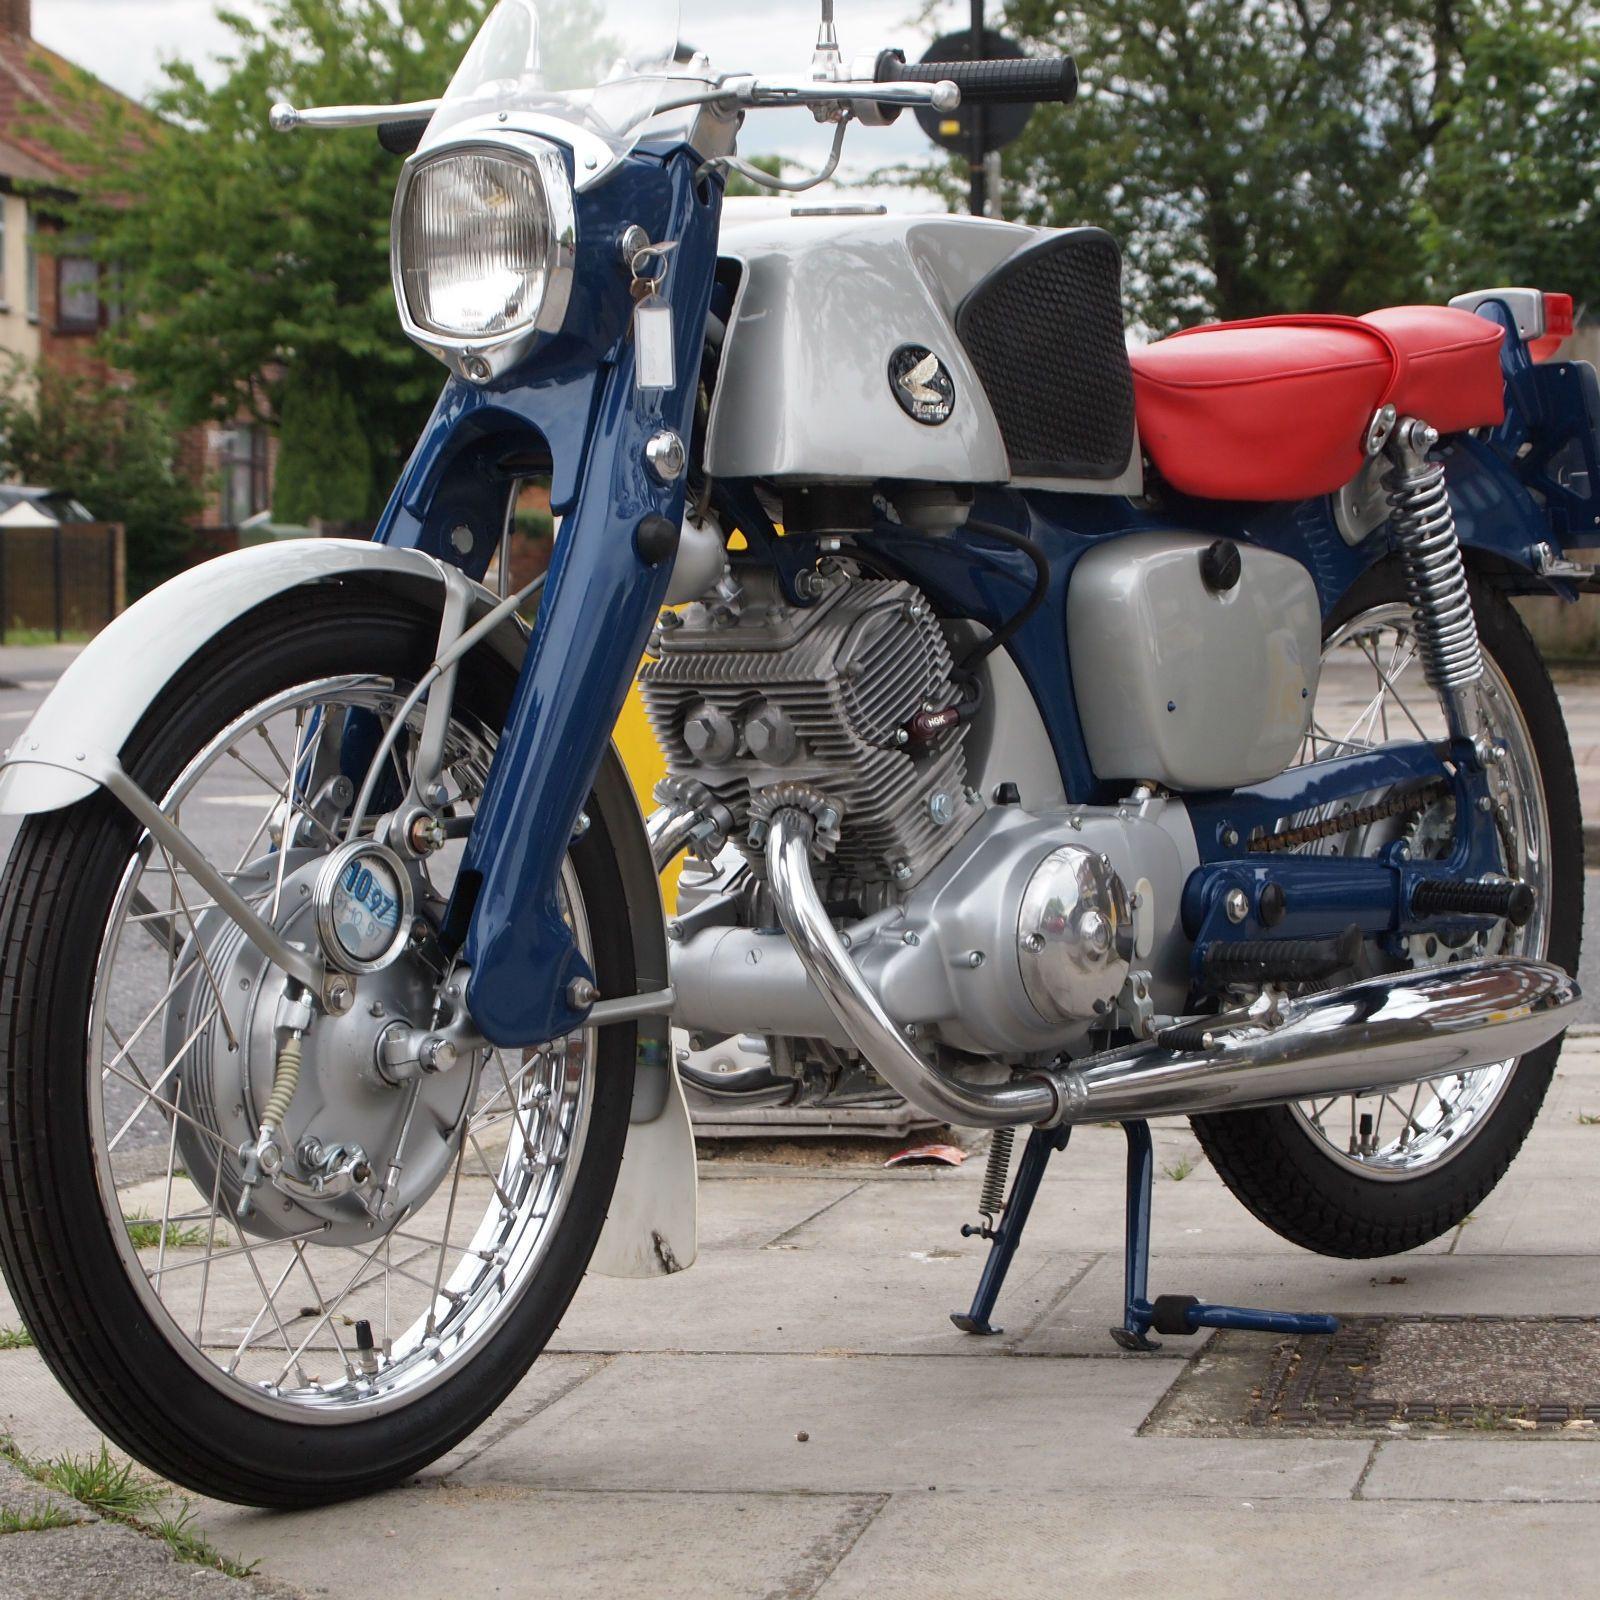 1964 Honda Cb92 125 Super Sport Benly Classic Very Very Rare Collectors Stunning Ebay Honda Sales Honda Motorcycles Honda